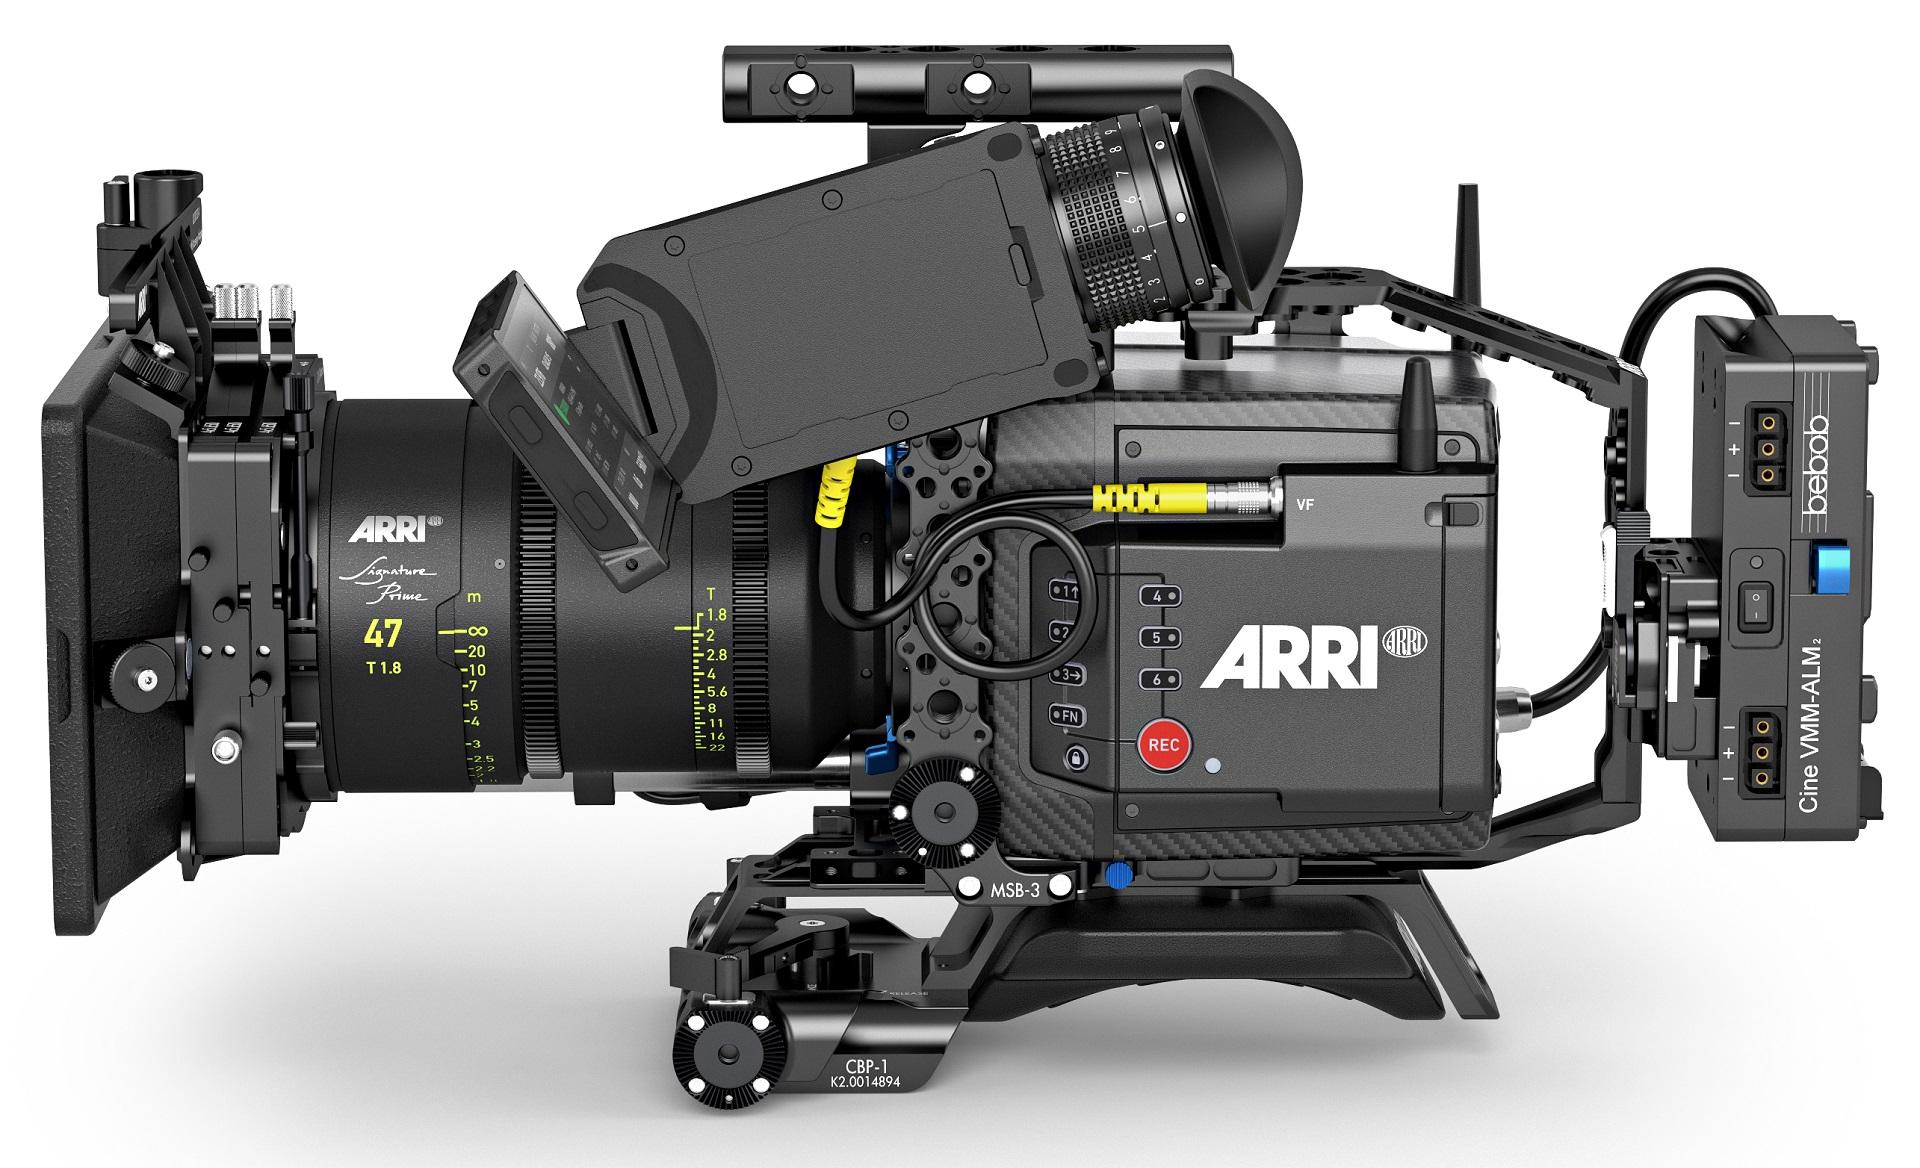 Arri Alexa Mini Lf Announced Large Format 4 5k Sensor In Small Camera Body Cined